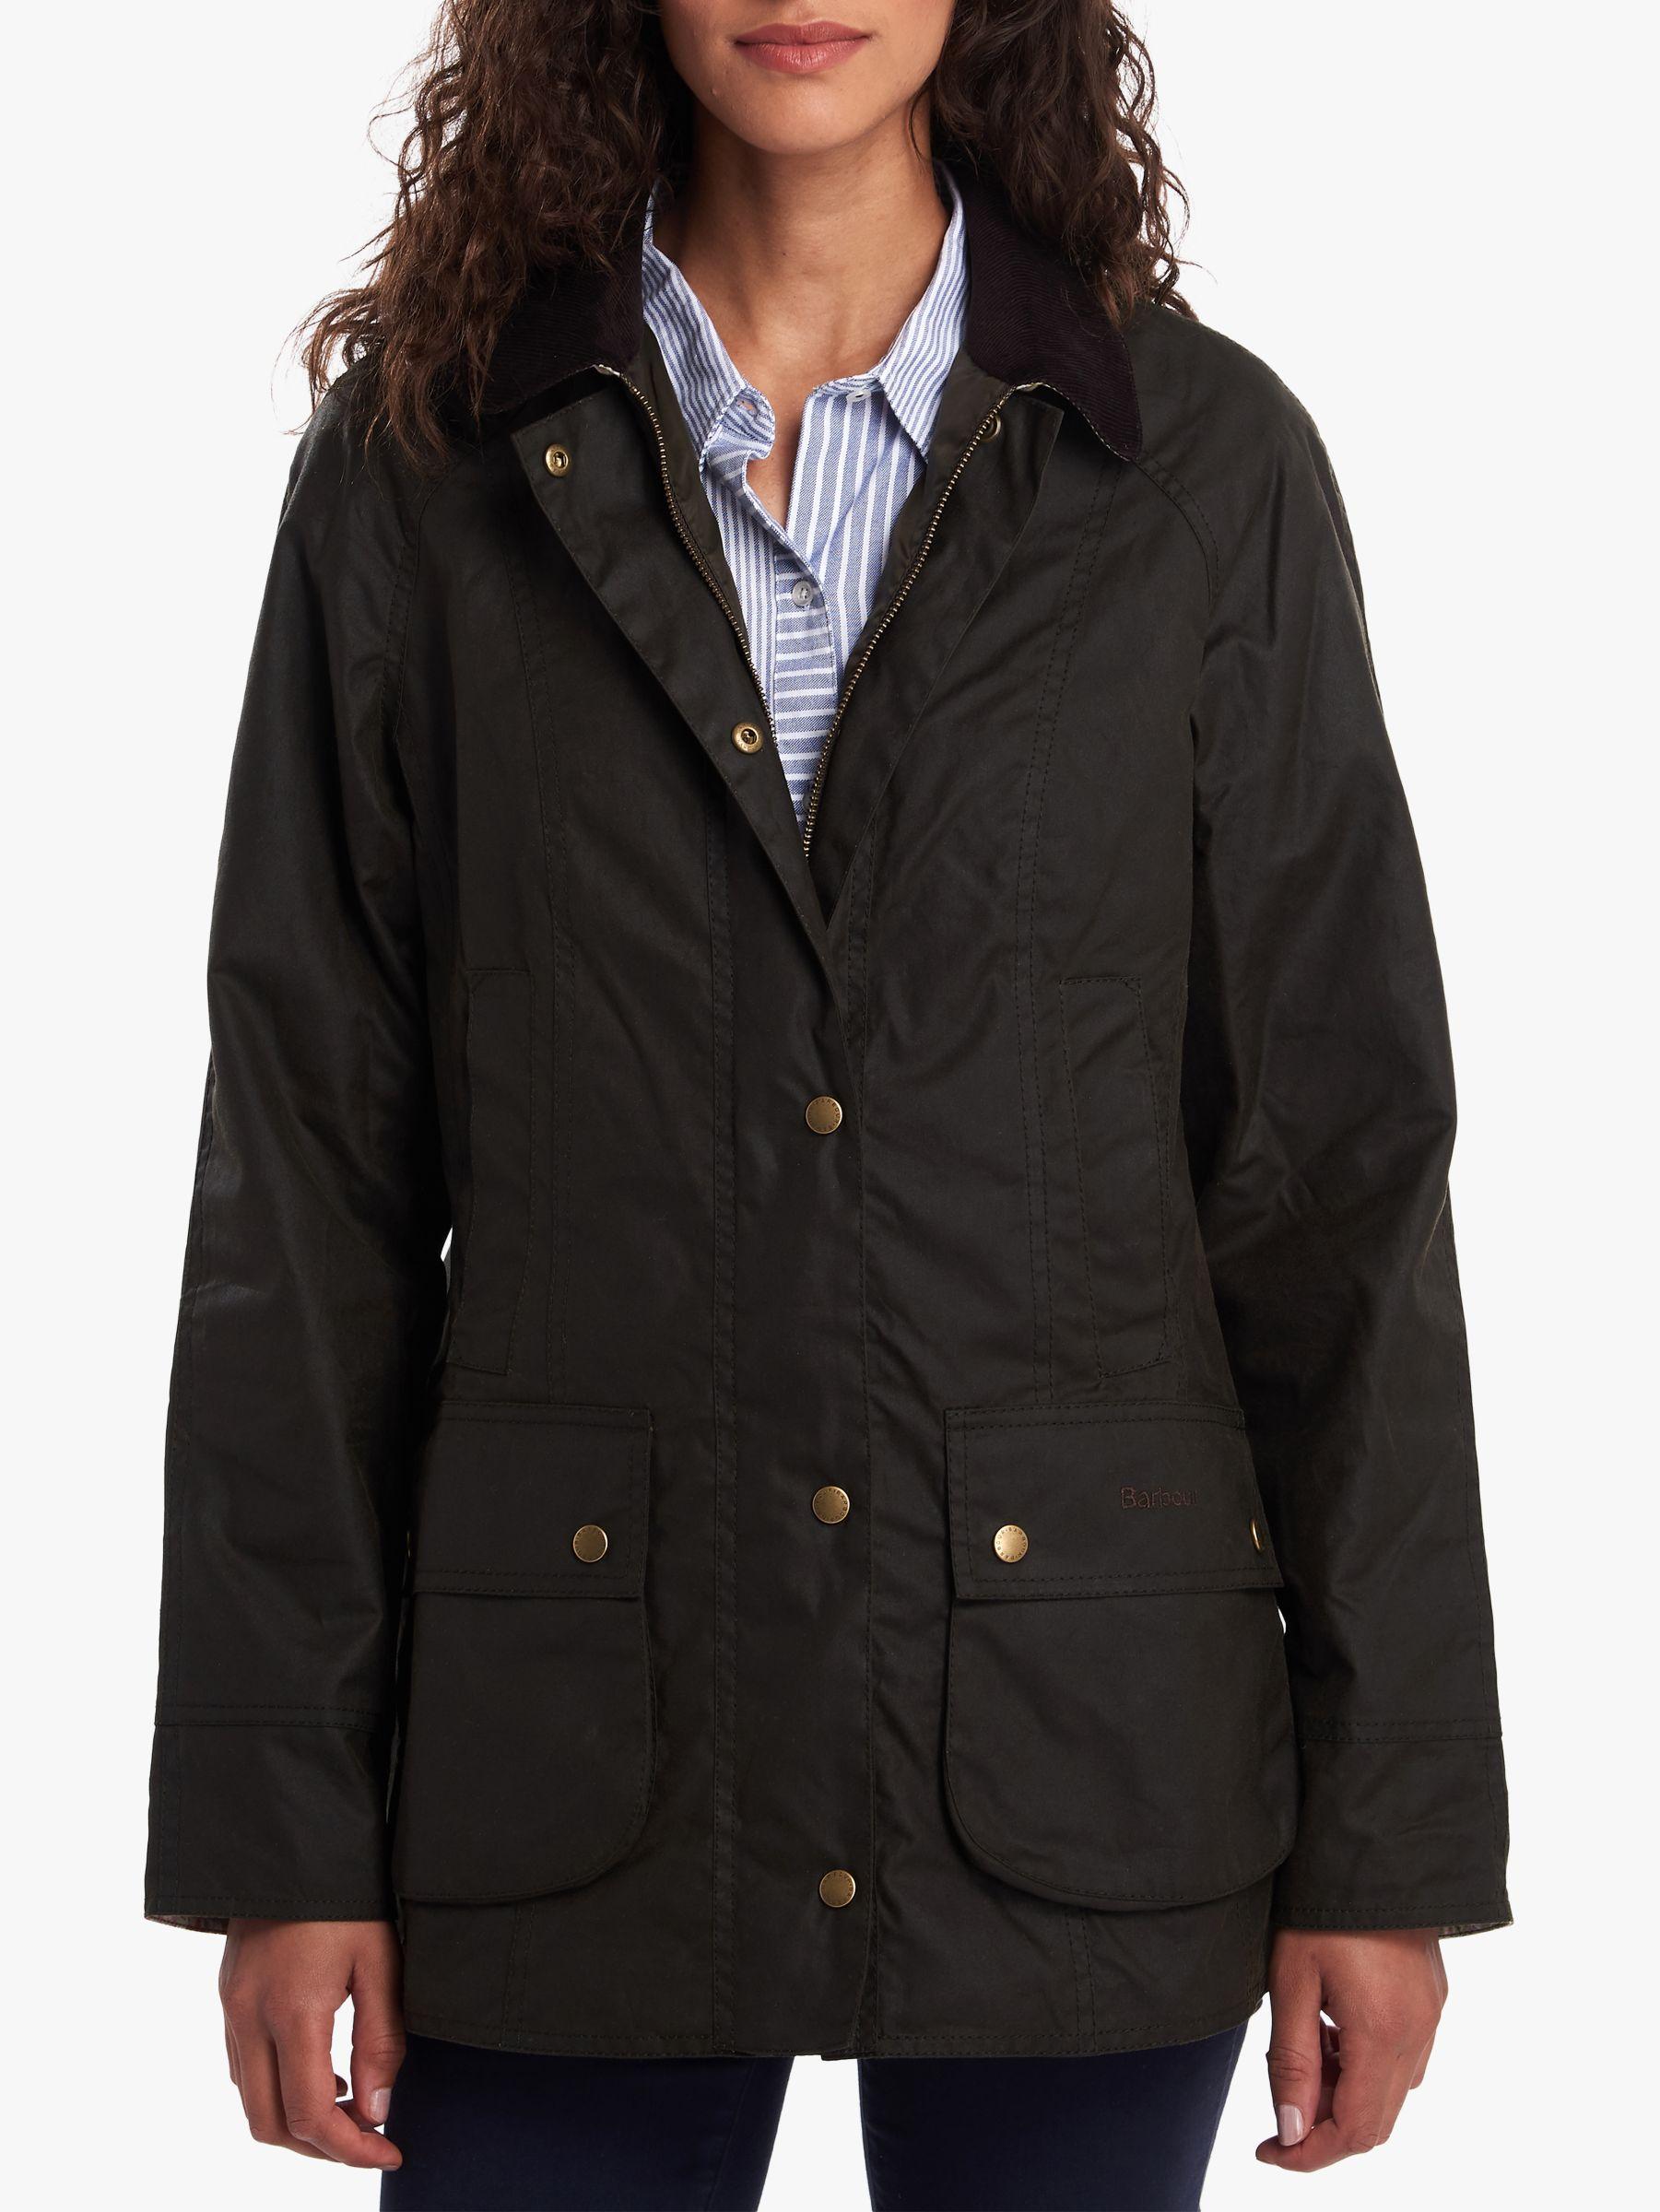 Barbour Barbour Cormorant Waxed Jacket